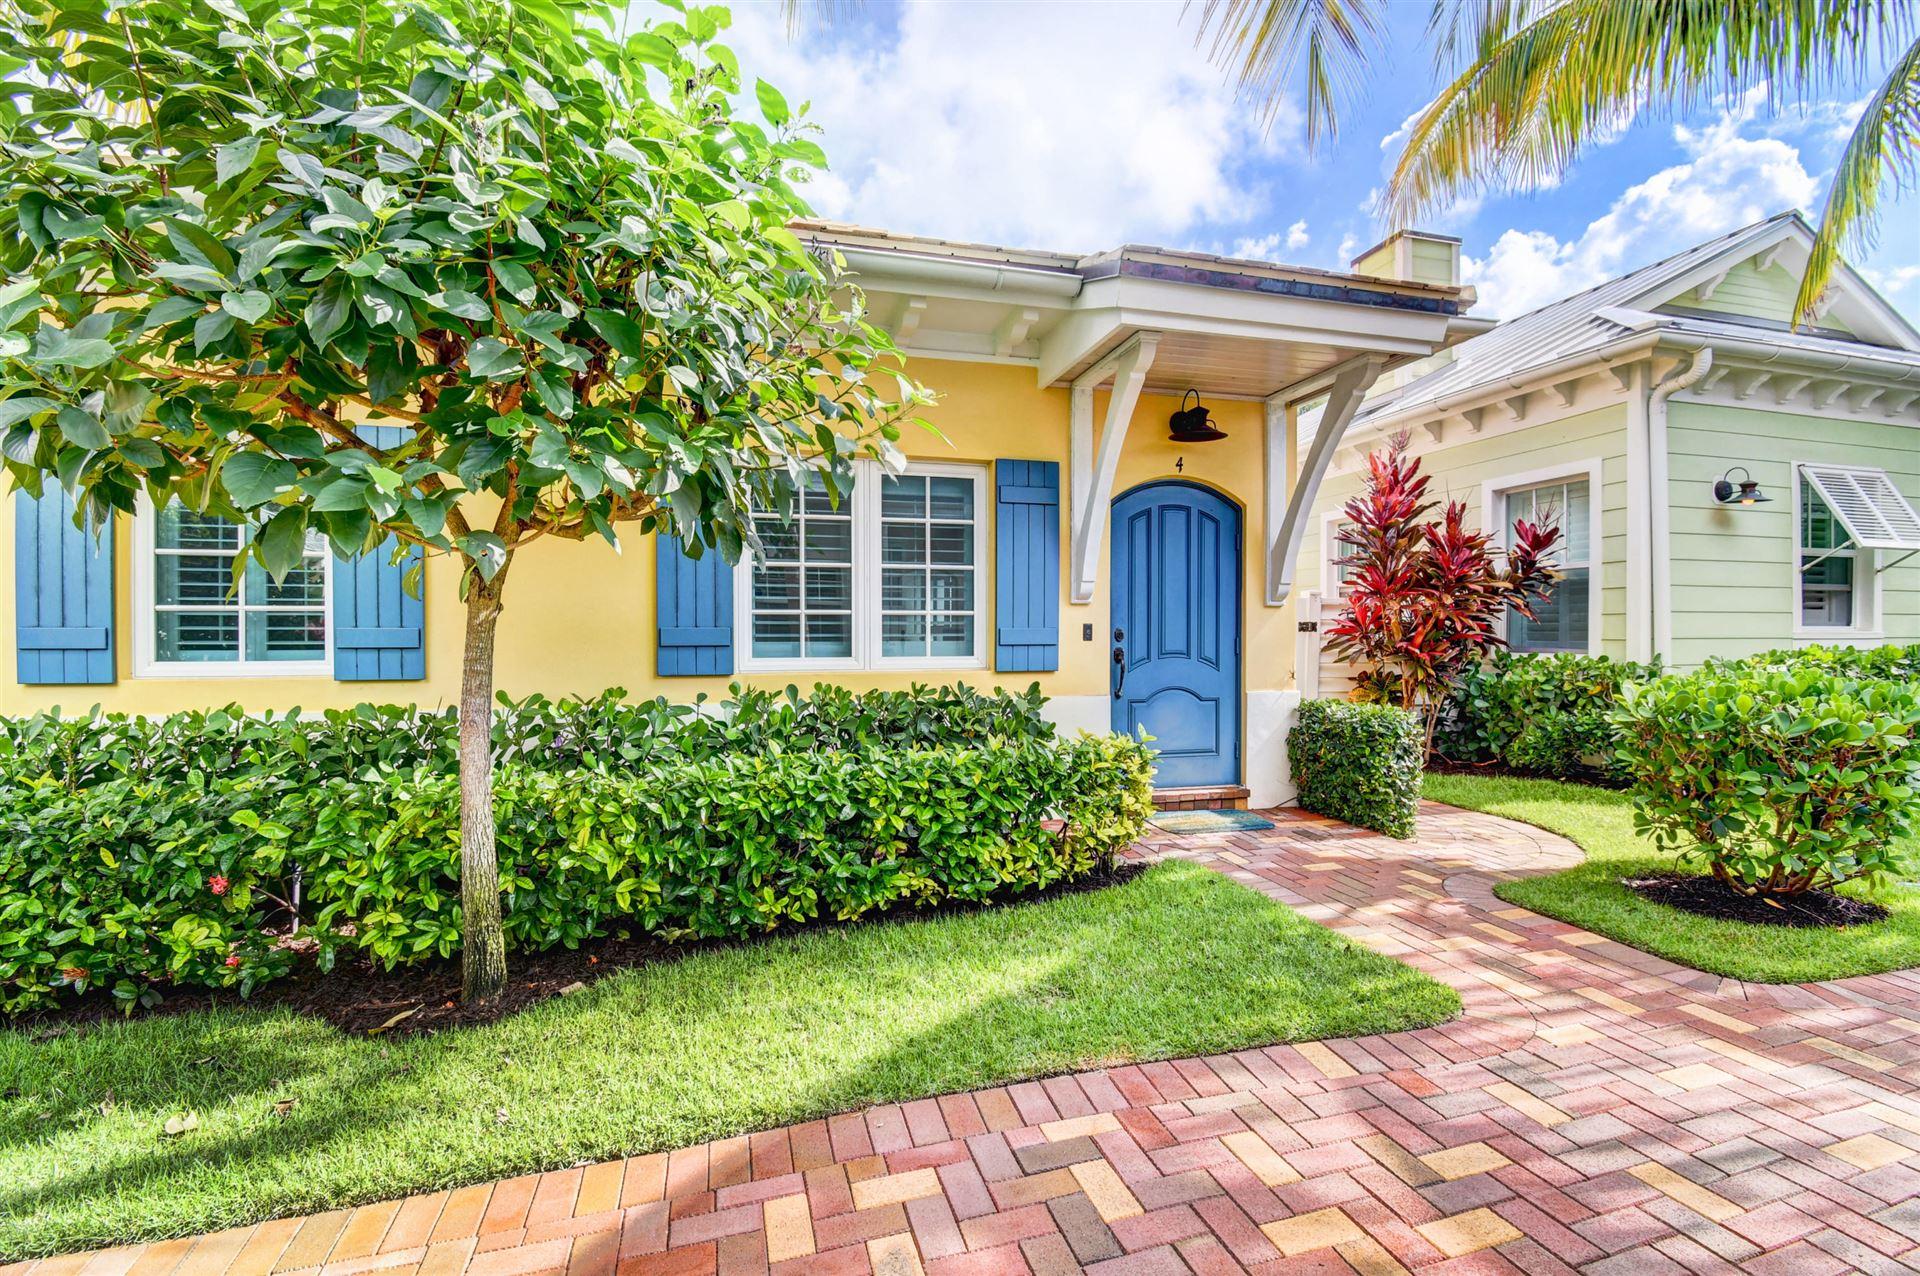 2225 S Ocean Boulevard #4, Delray Beach, FL 33483 - #: RX-10626782